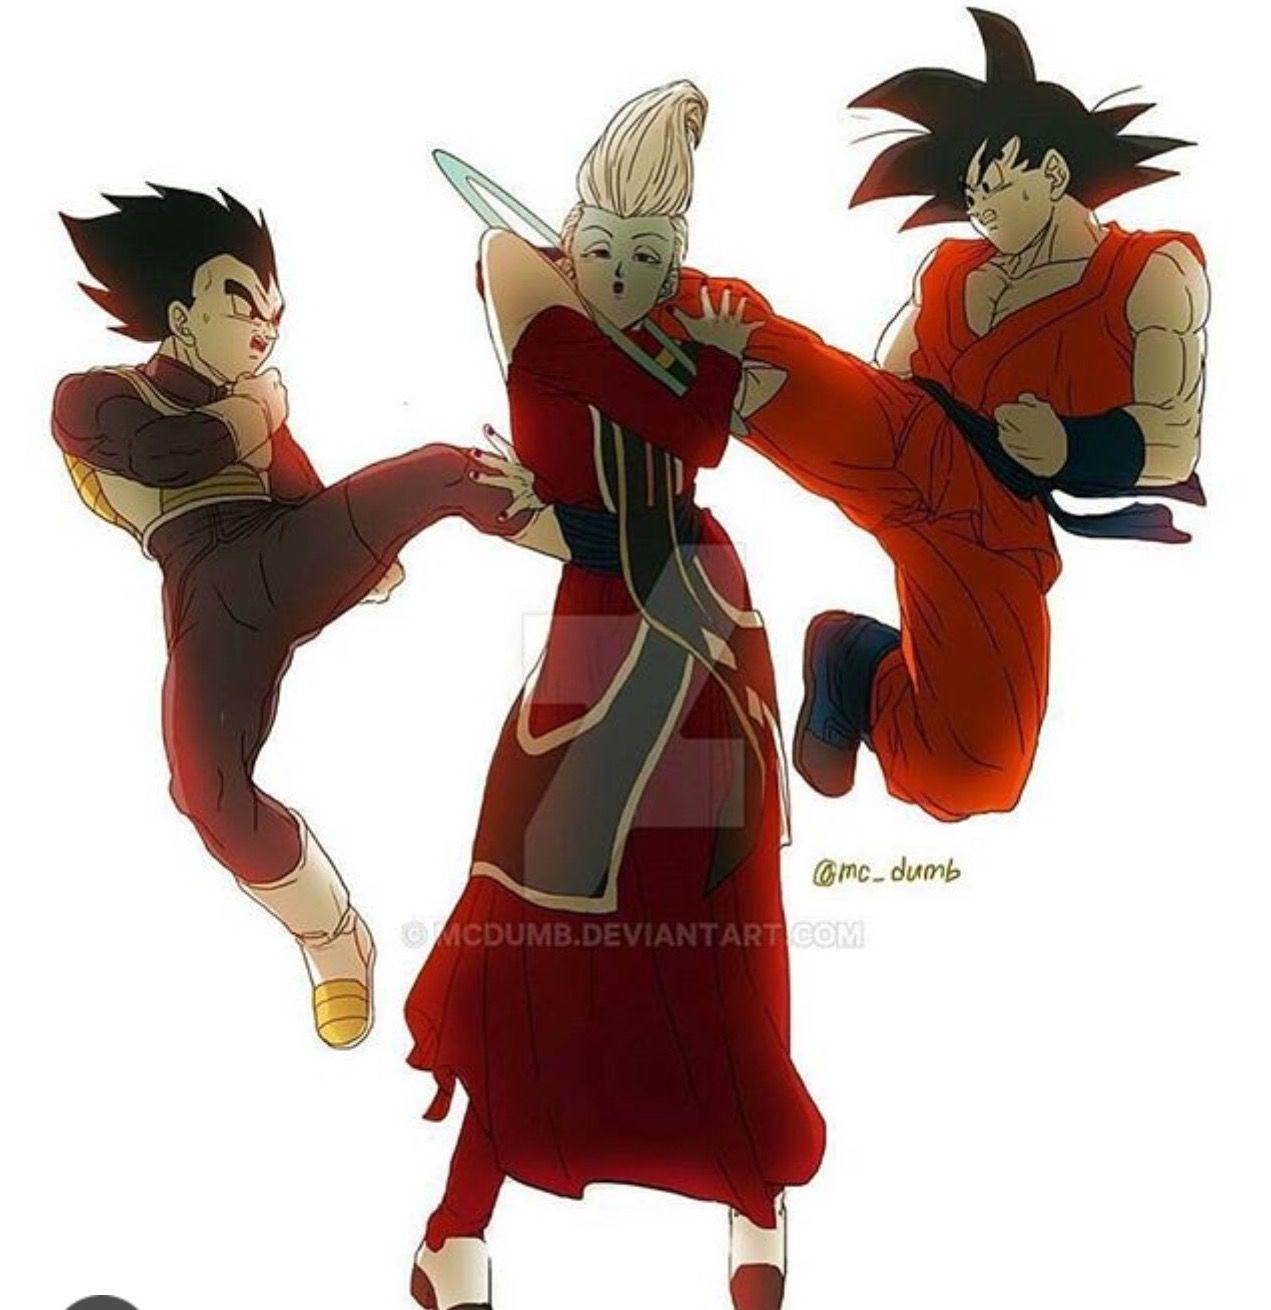 Pin By Iosif O On Dbz Anime Dragon Ball Super Dragon Ball Art Anime Dragon Ball